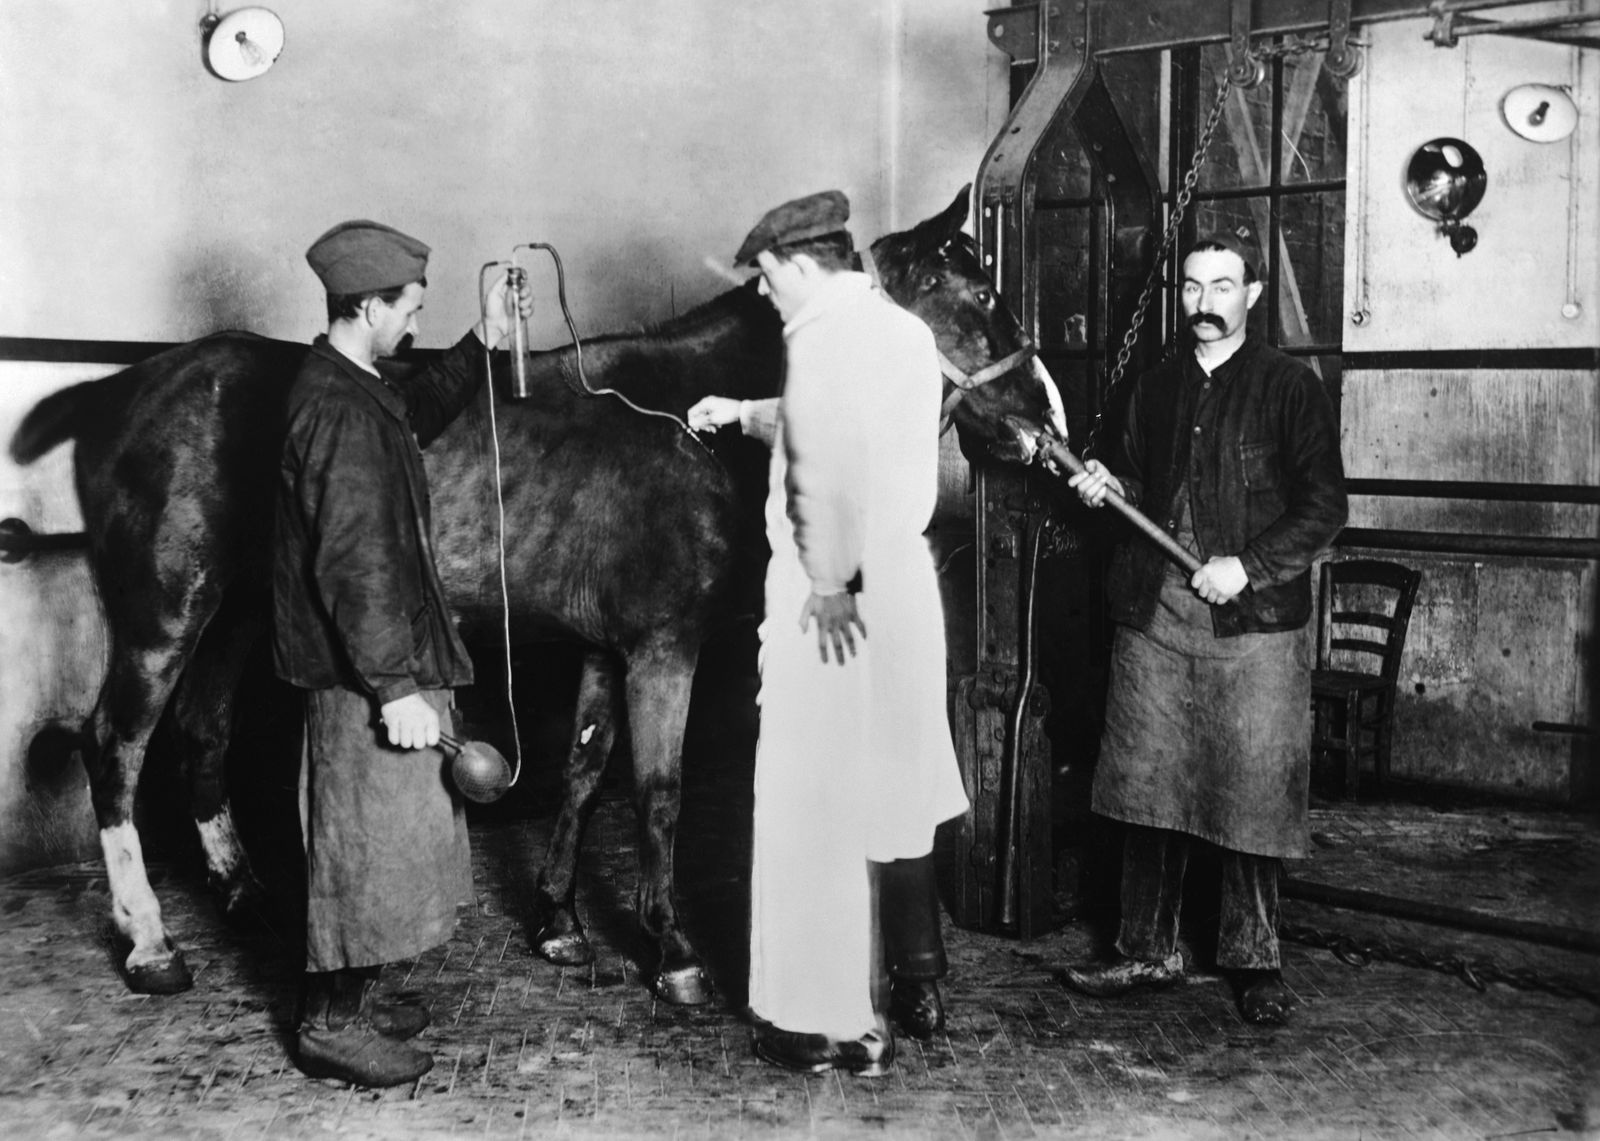 Men Inoculating Horse